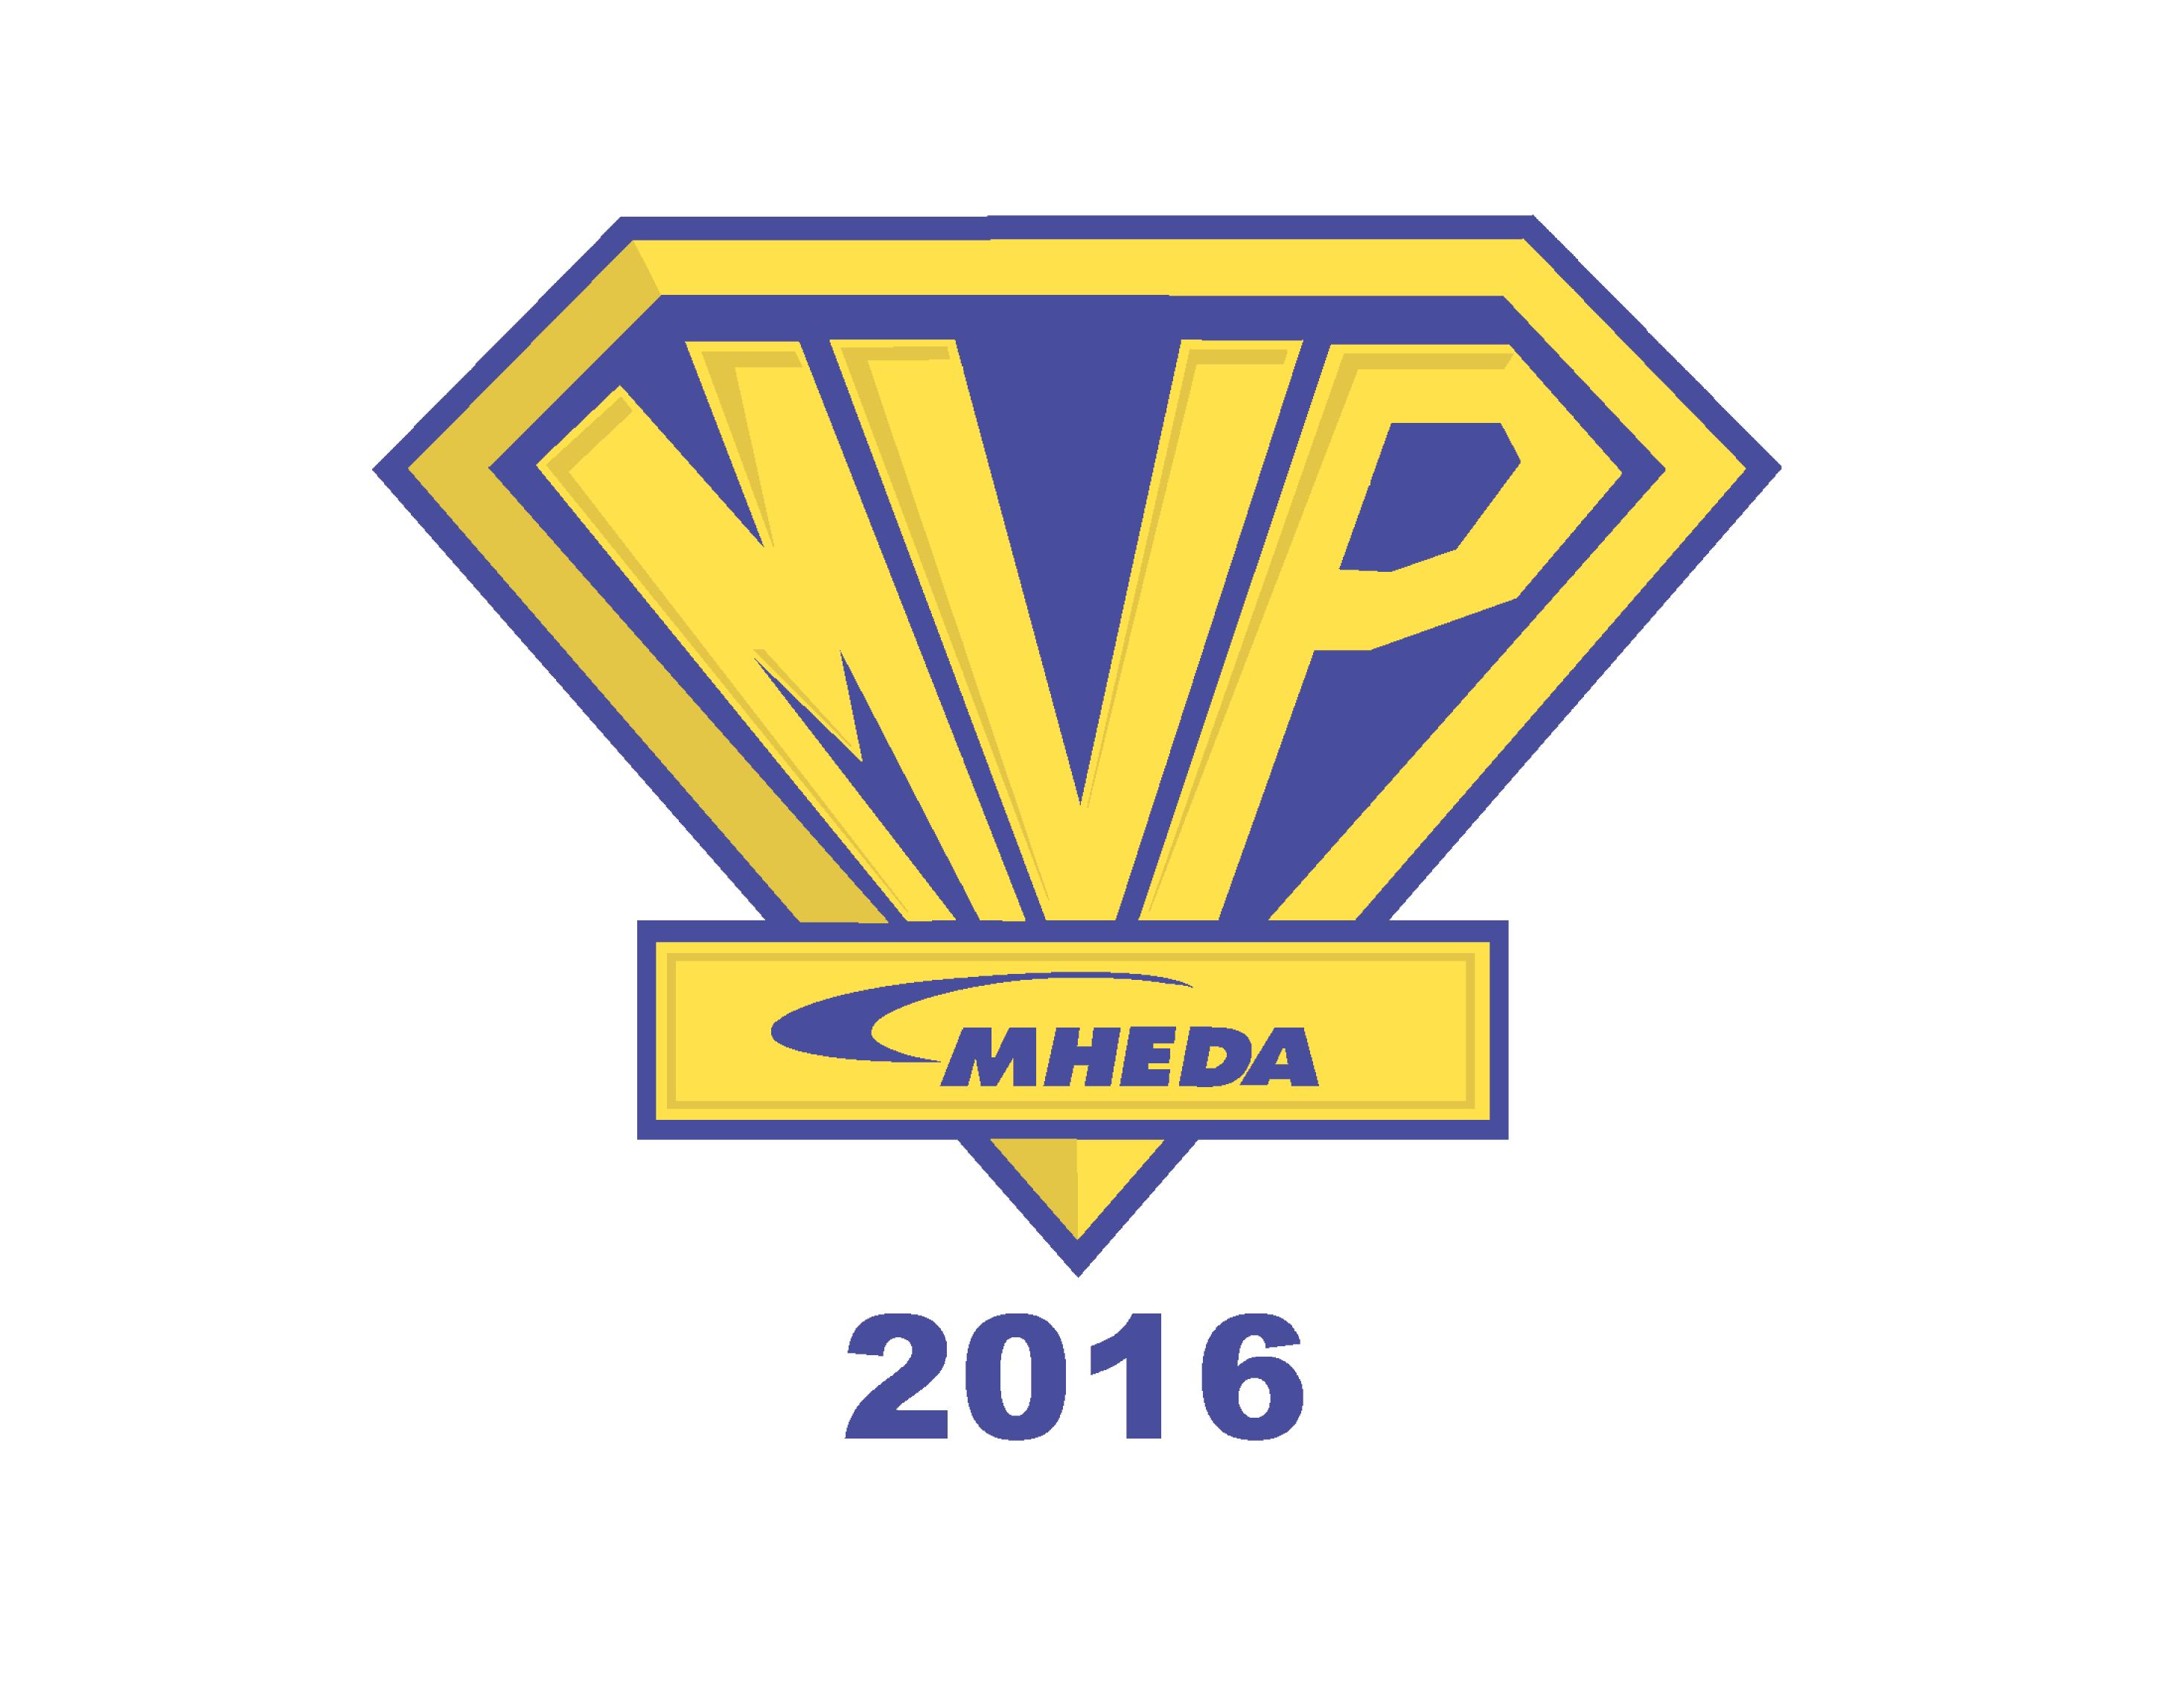 MHEDA MVP LOGO 2016